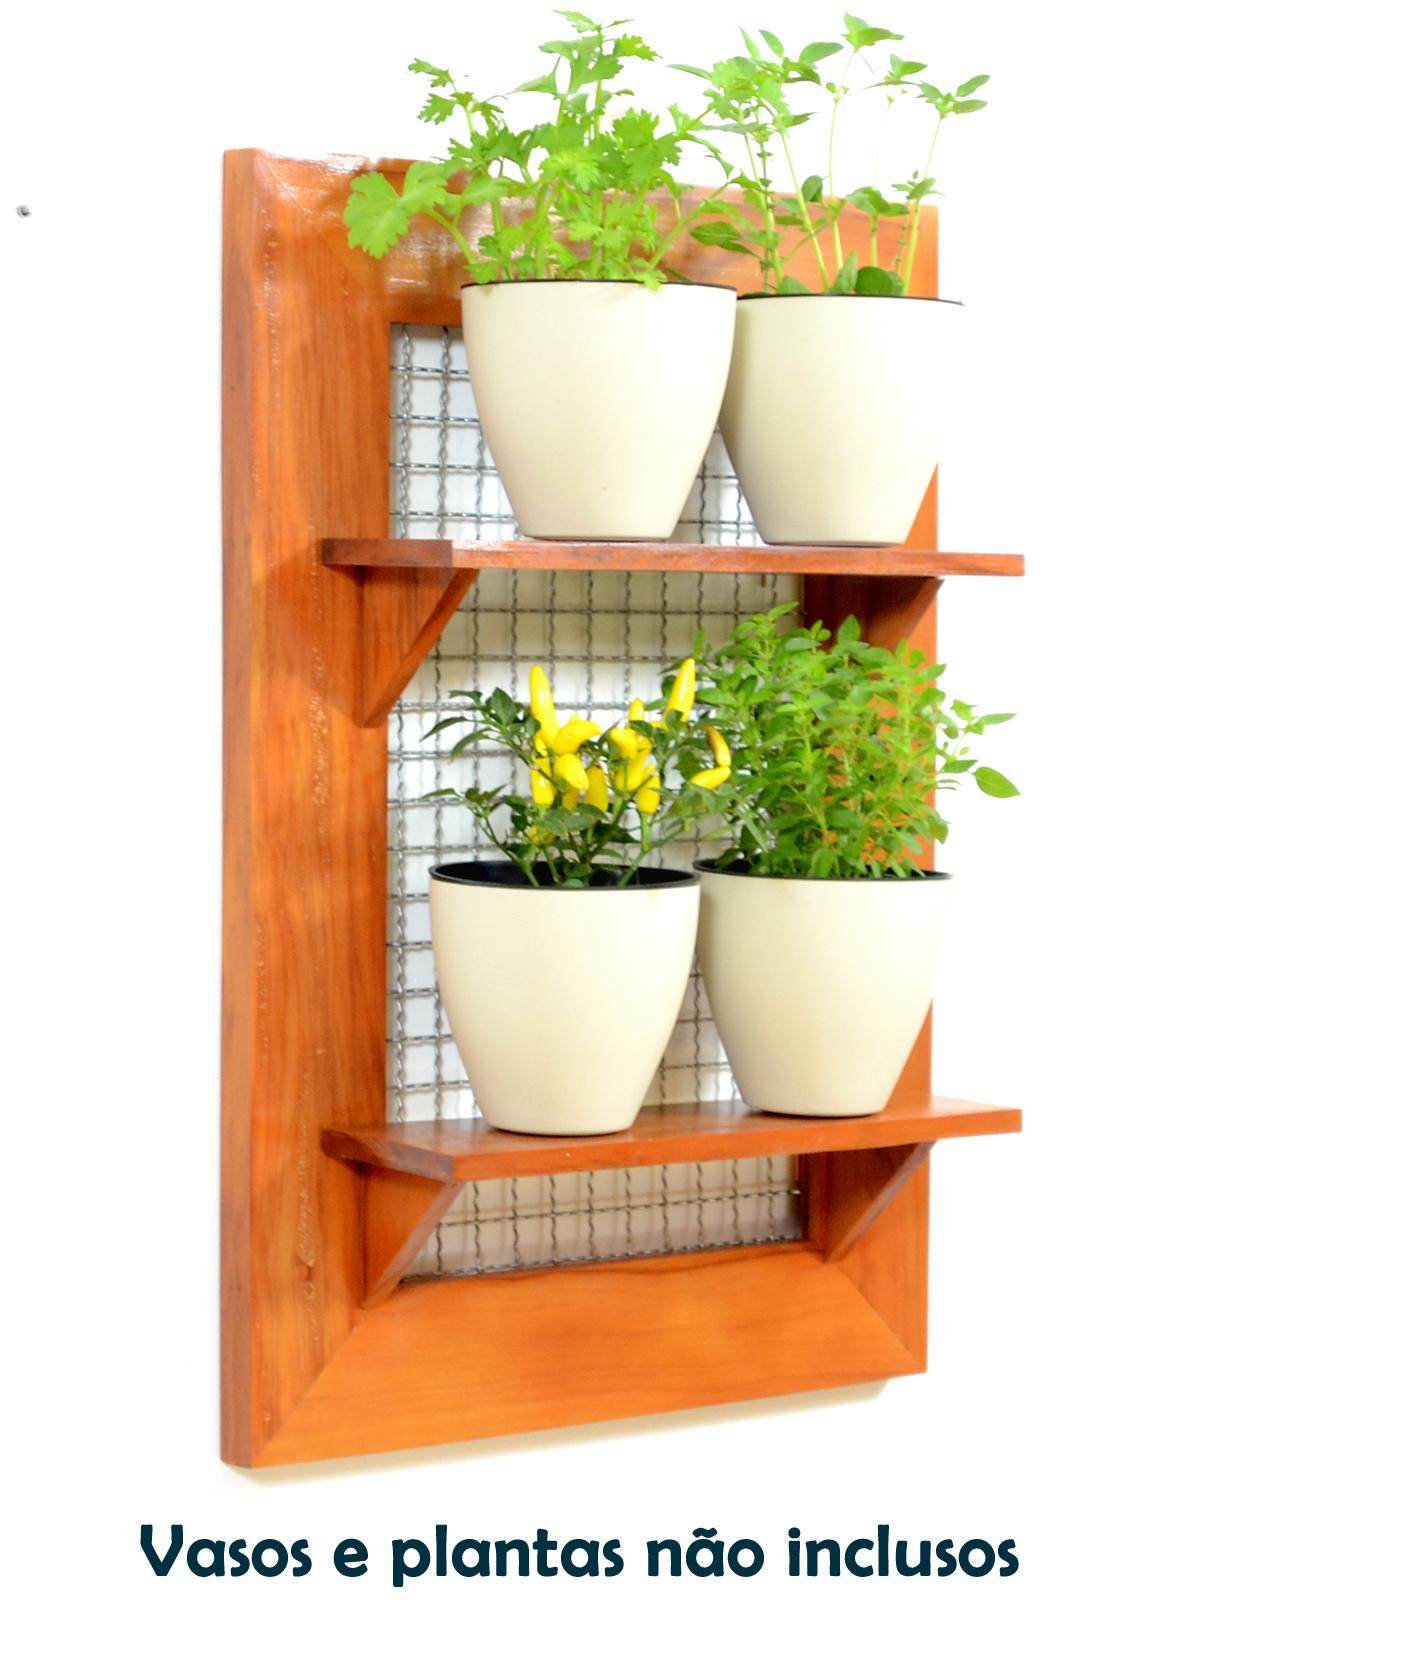 Pallet para sua horta vertical